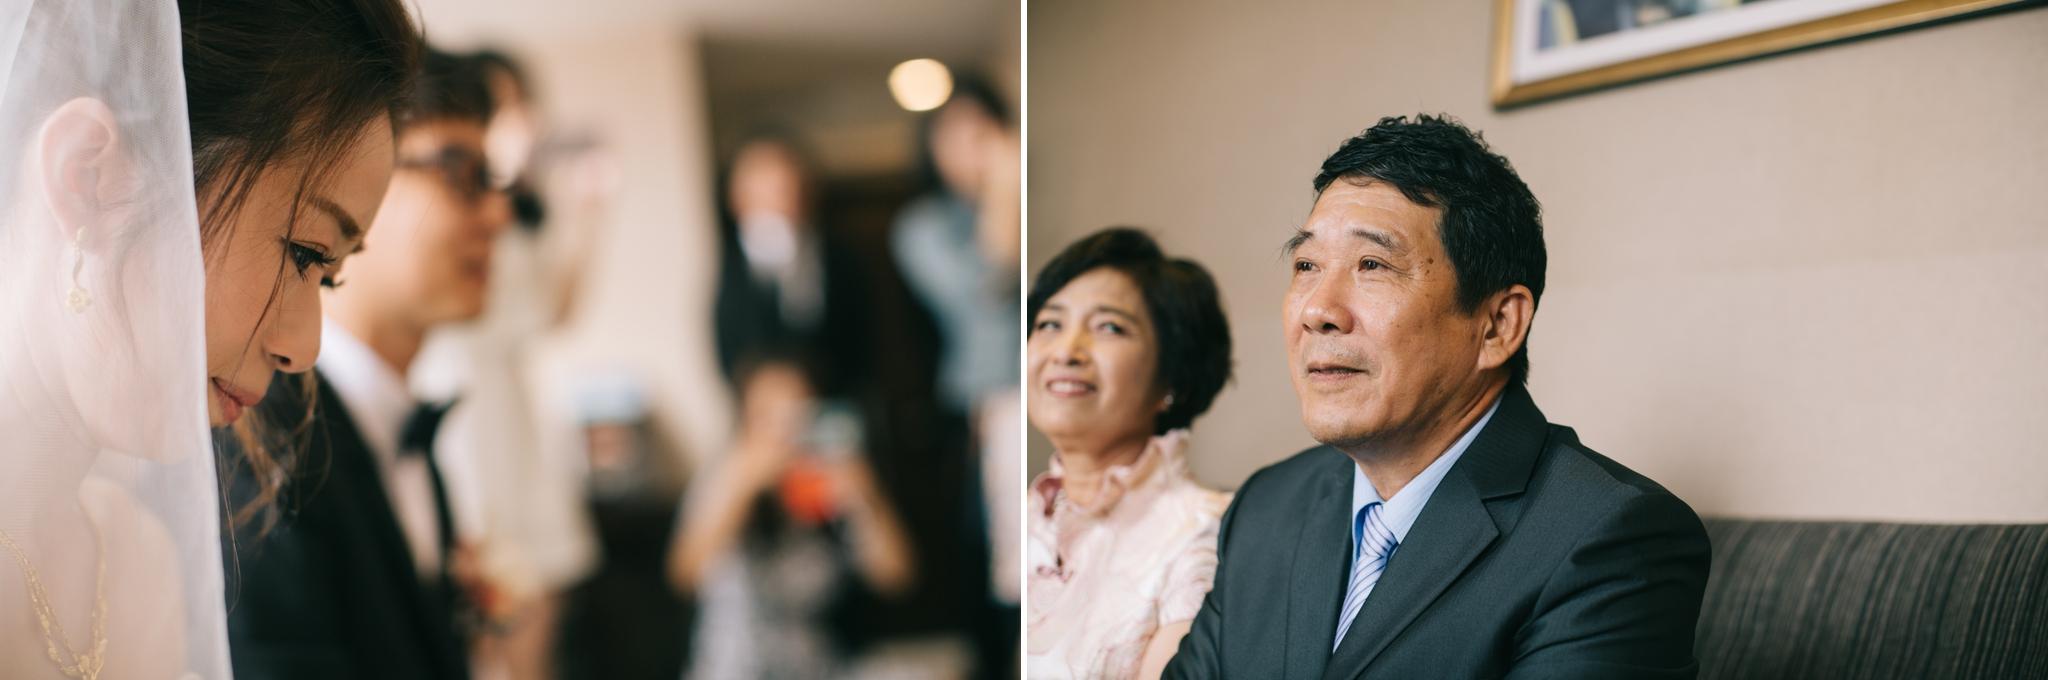 Tina+Nash-wedding-台北婚禮迎娶晚宴-新莊終身大事-058.jpg